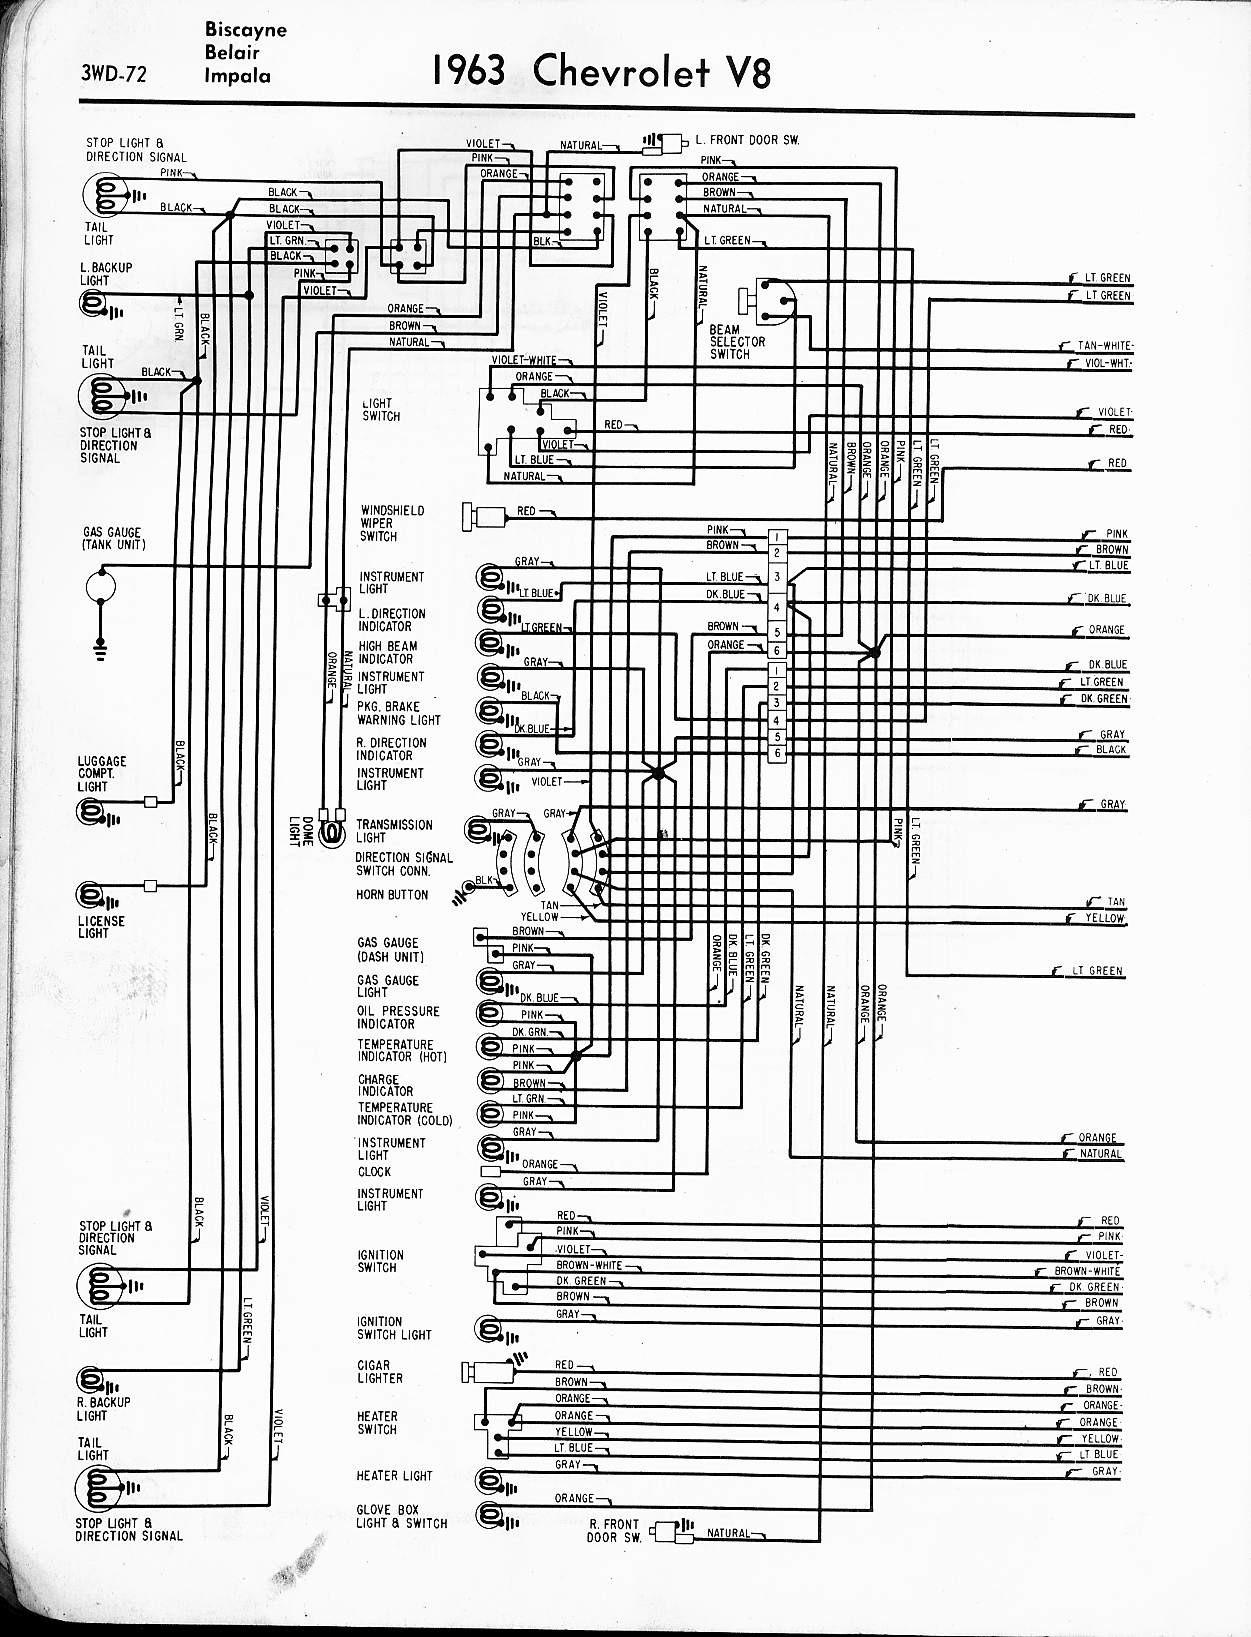 Wiring Diagram PDF: 2003 Malibu Wiring Diagram